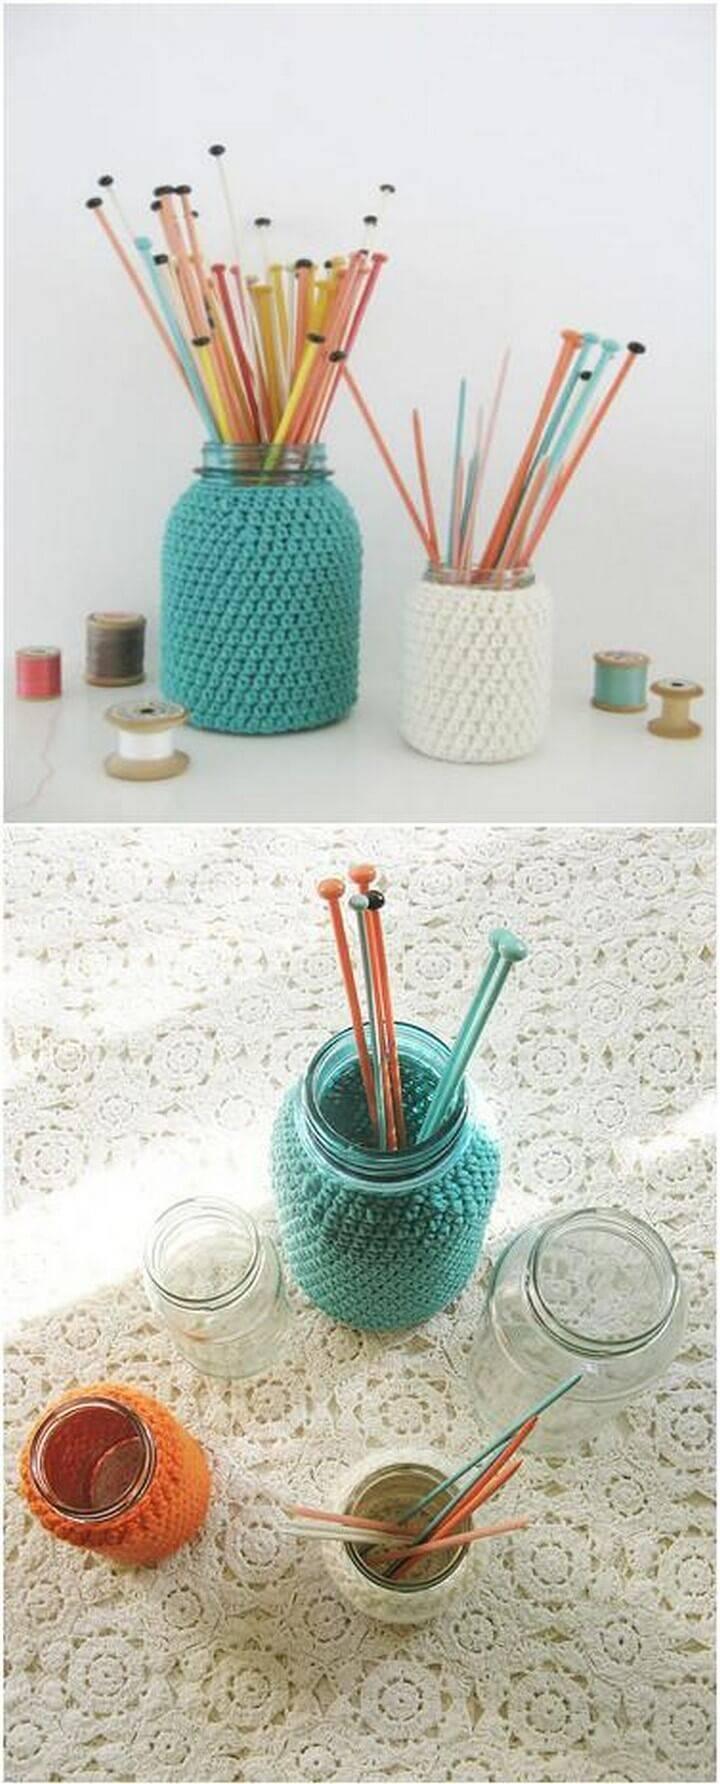 DIY Knitted Mason Jar Knitting Needle Holders